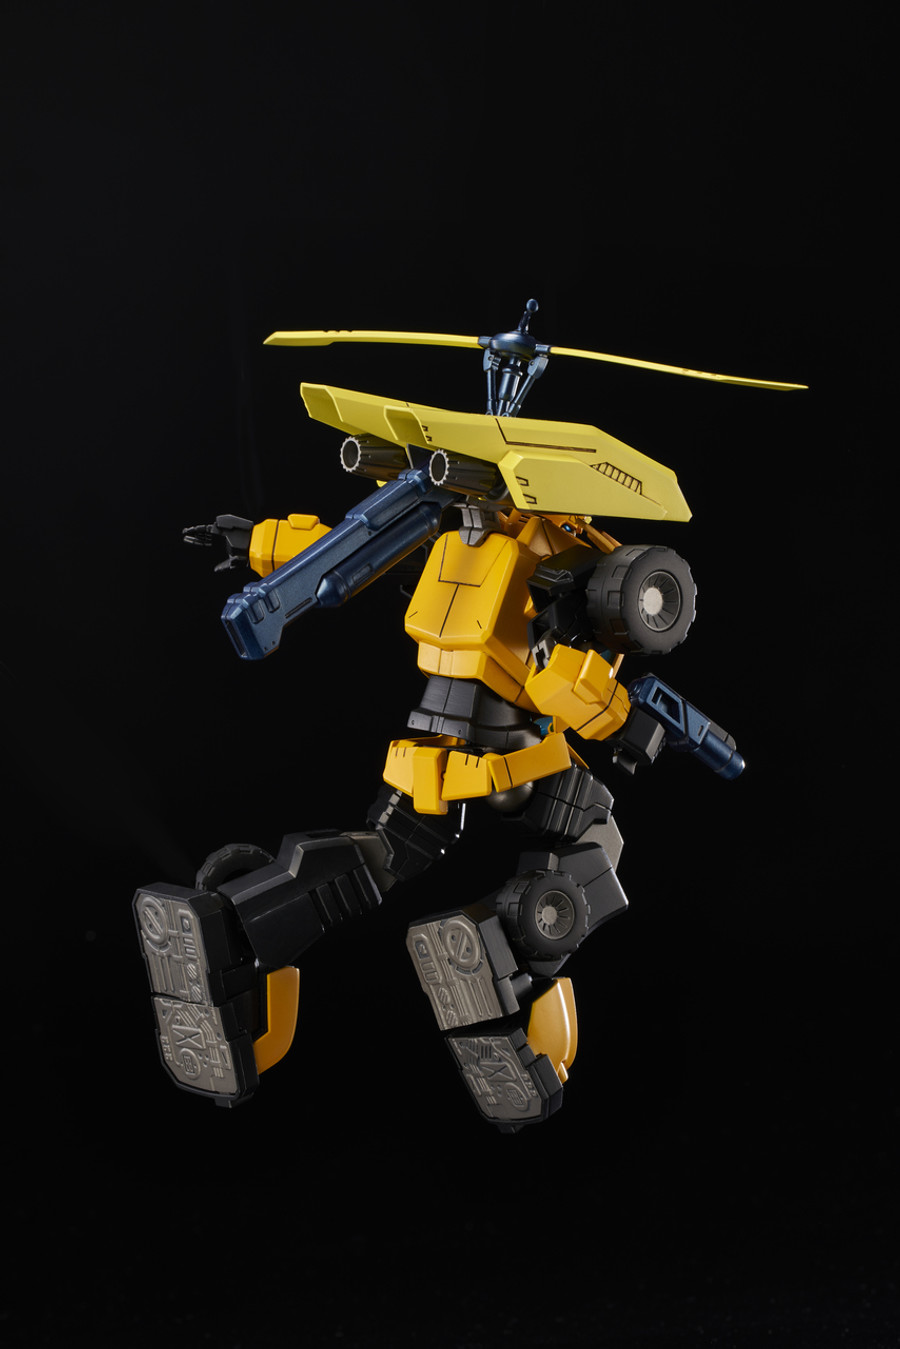 Flame Toys - Furai Model 04: Bumble Bee